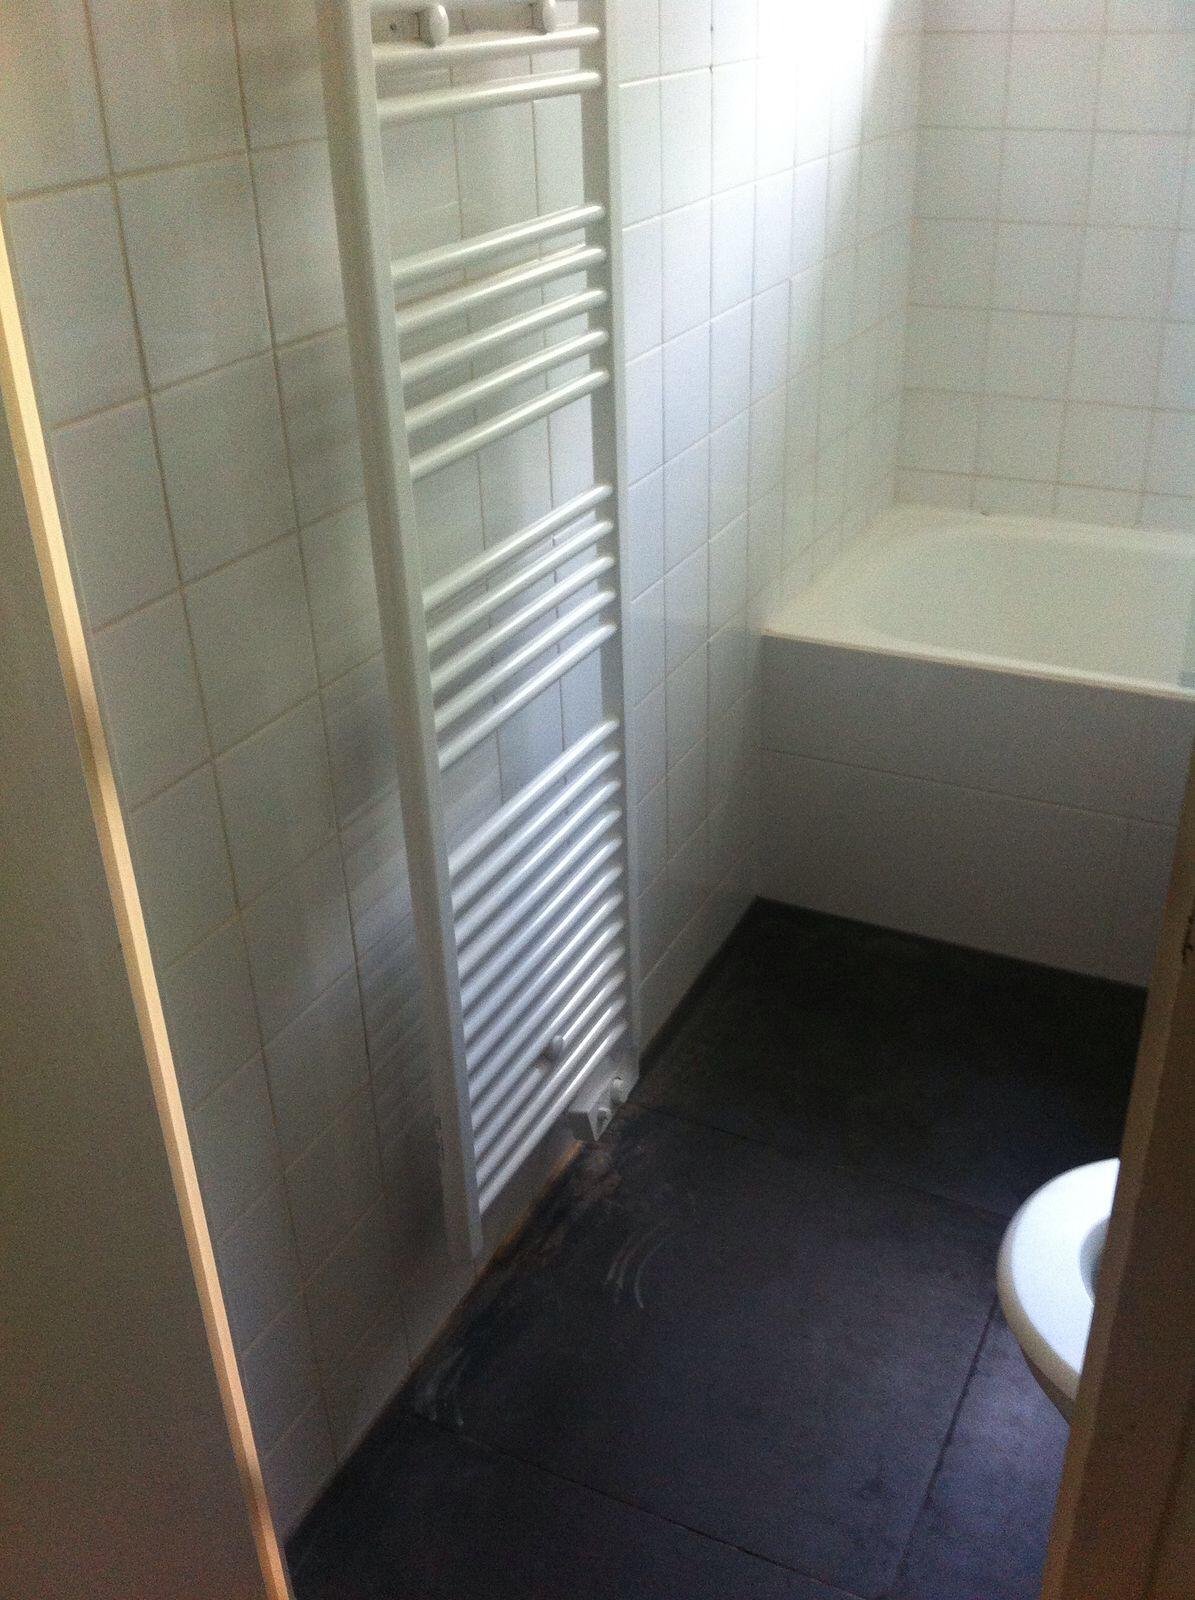 Handdoekradiator in beide badkamers